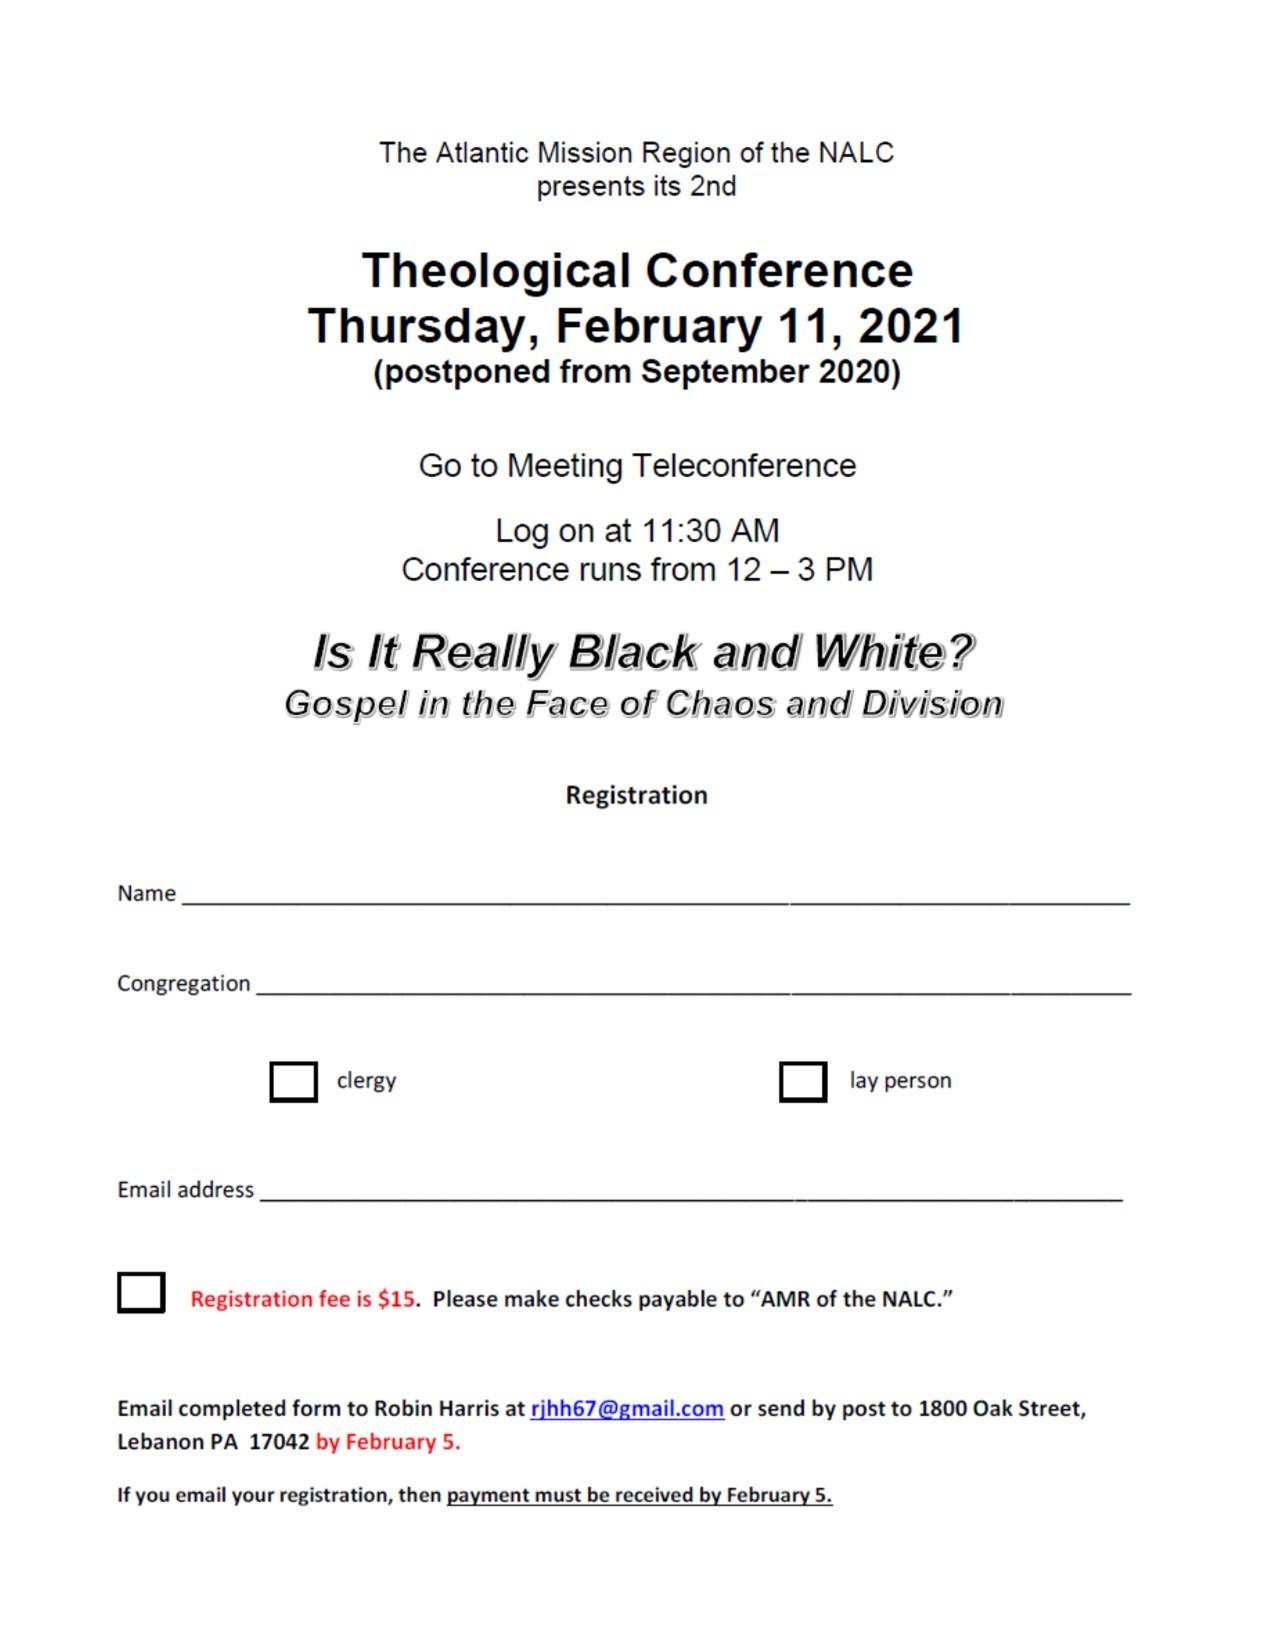 TC registration